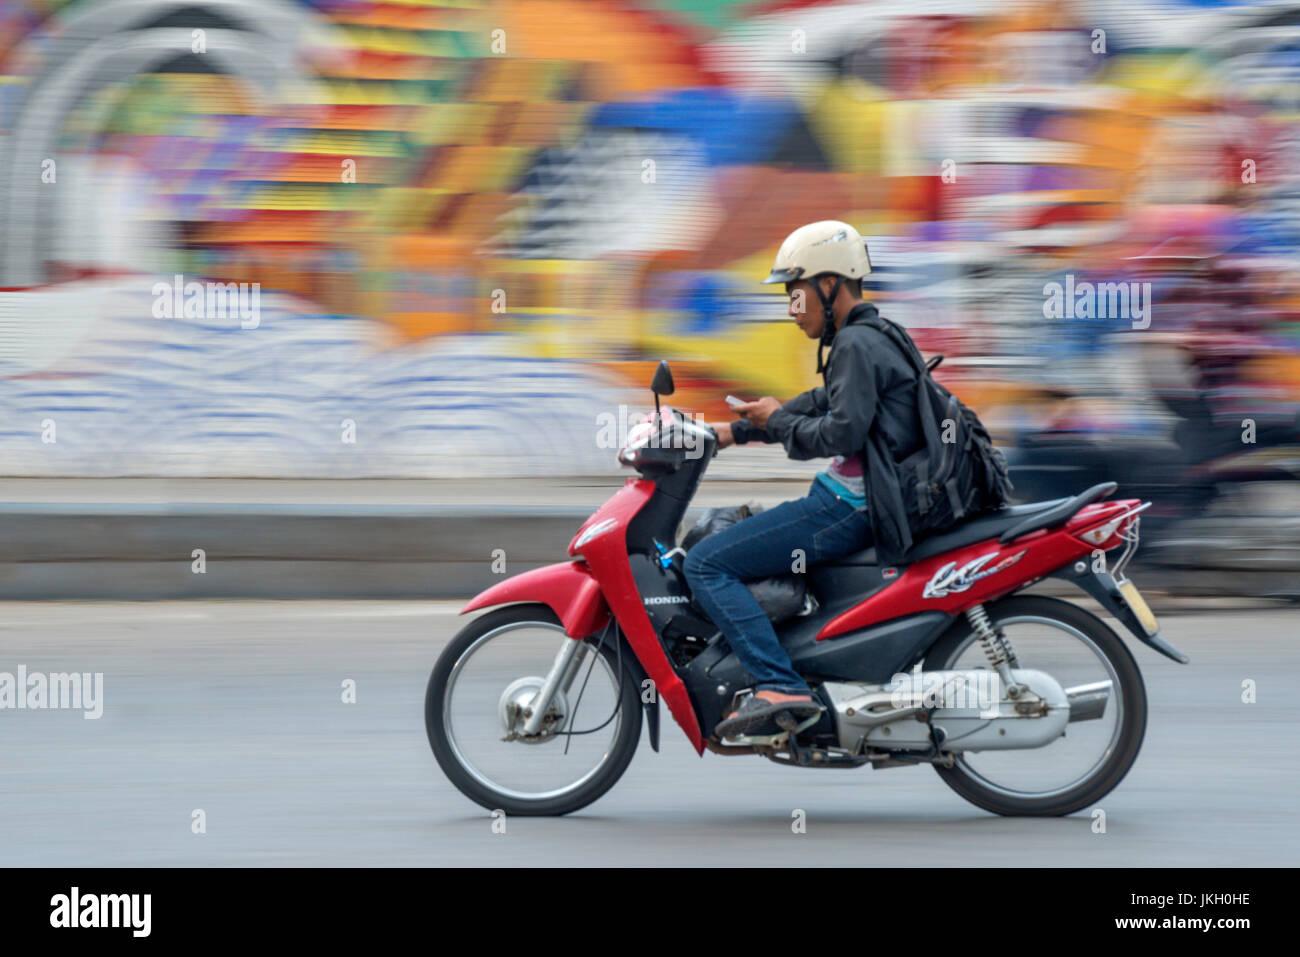 Street scene with motorbike Hanoi Vietnam - Stock Image